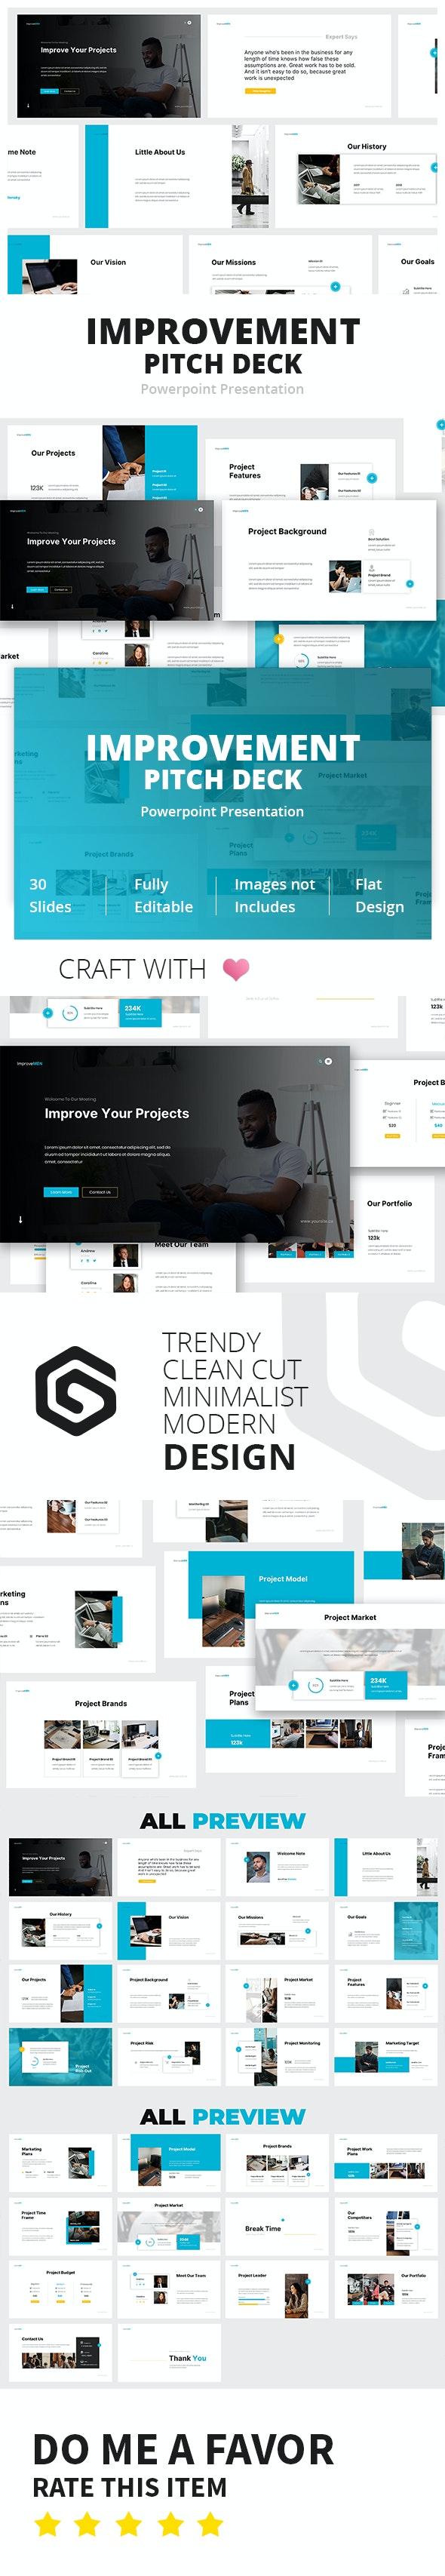 Improvement Pitch Deck Powerpoint Template - Business PowerPoint Templates